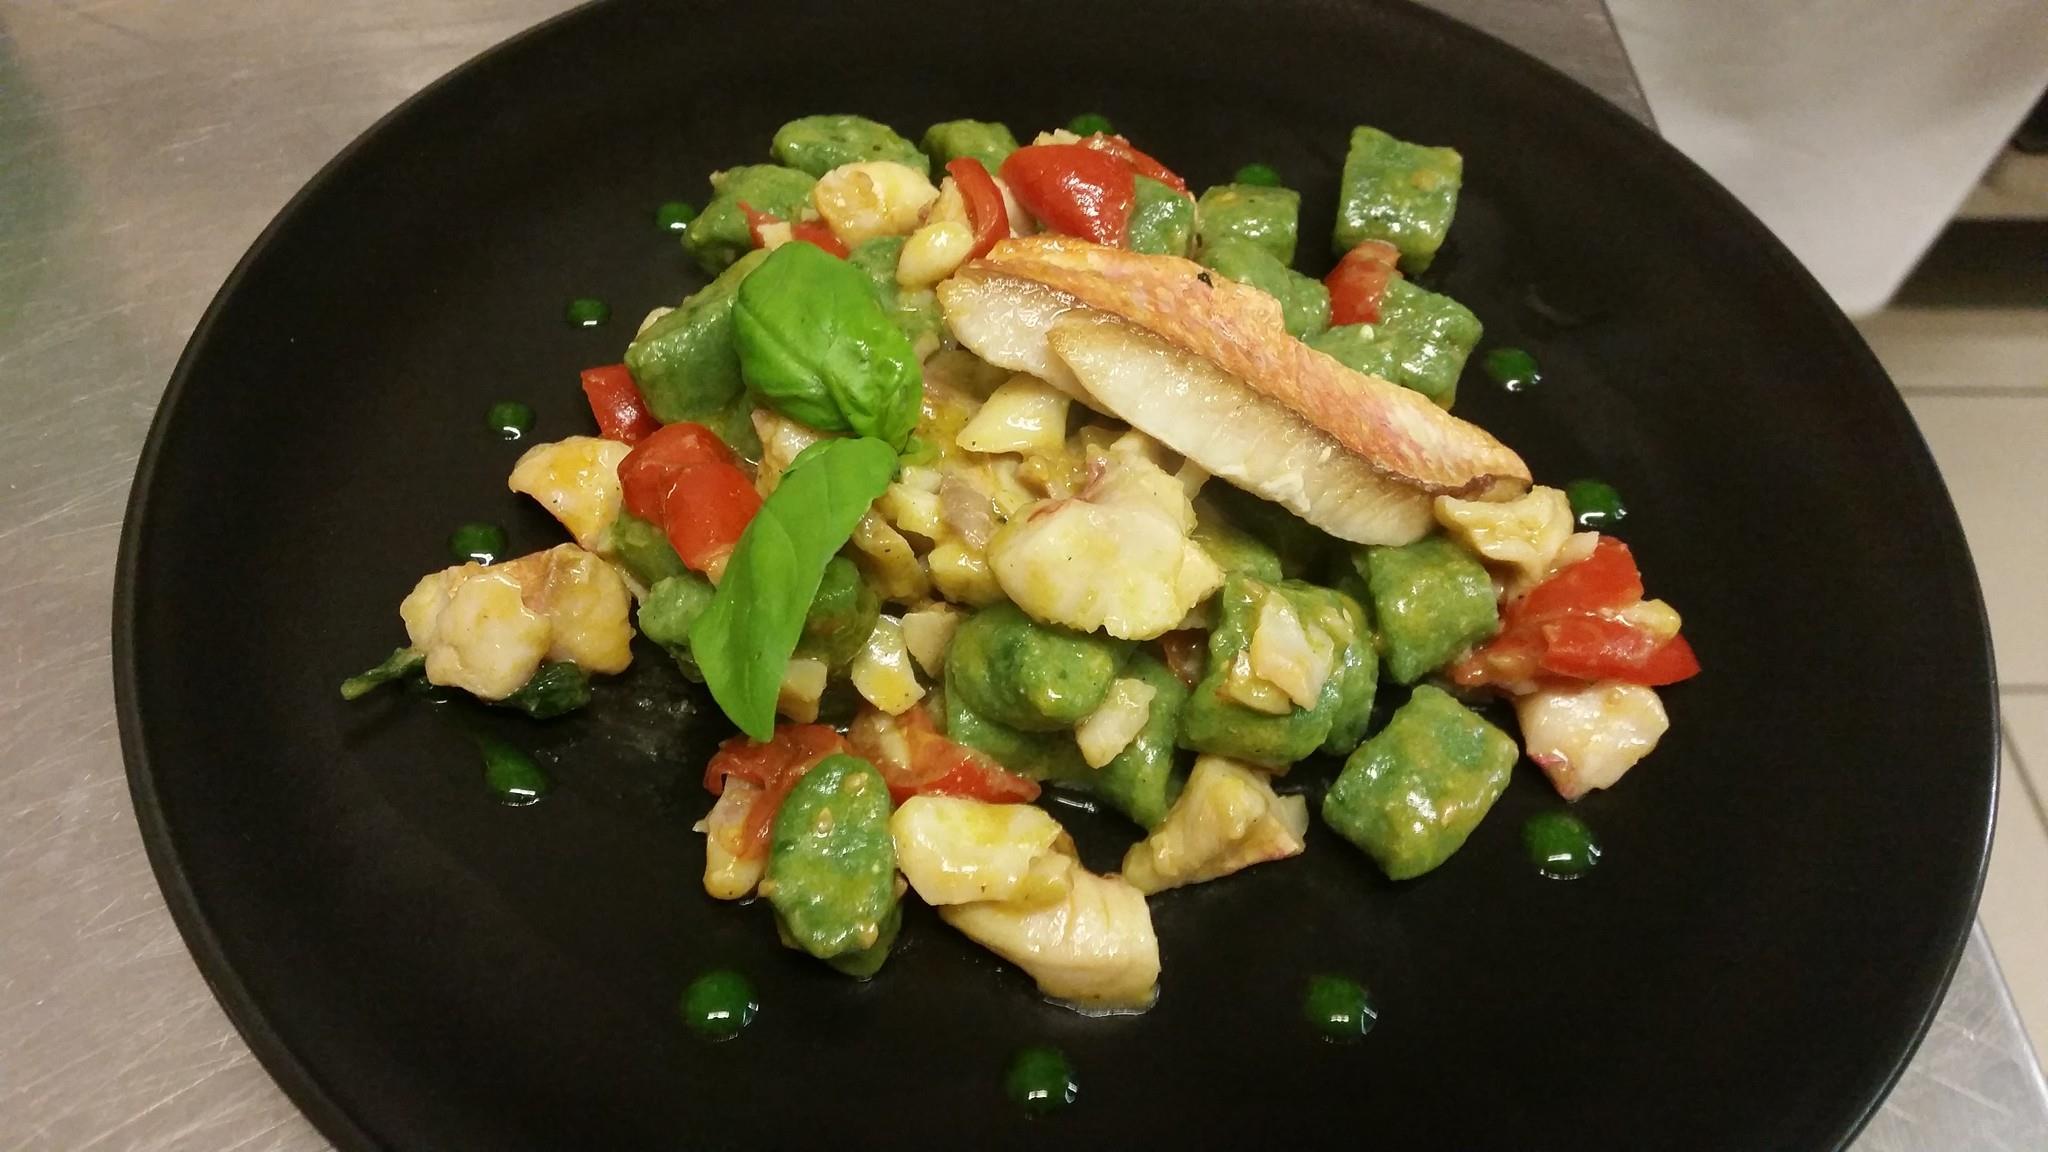 piatto a base di pesce in salsa verde e pomodori tagliati